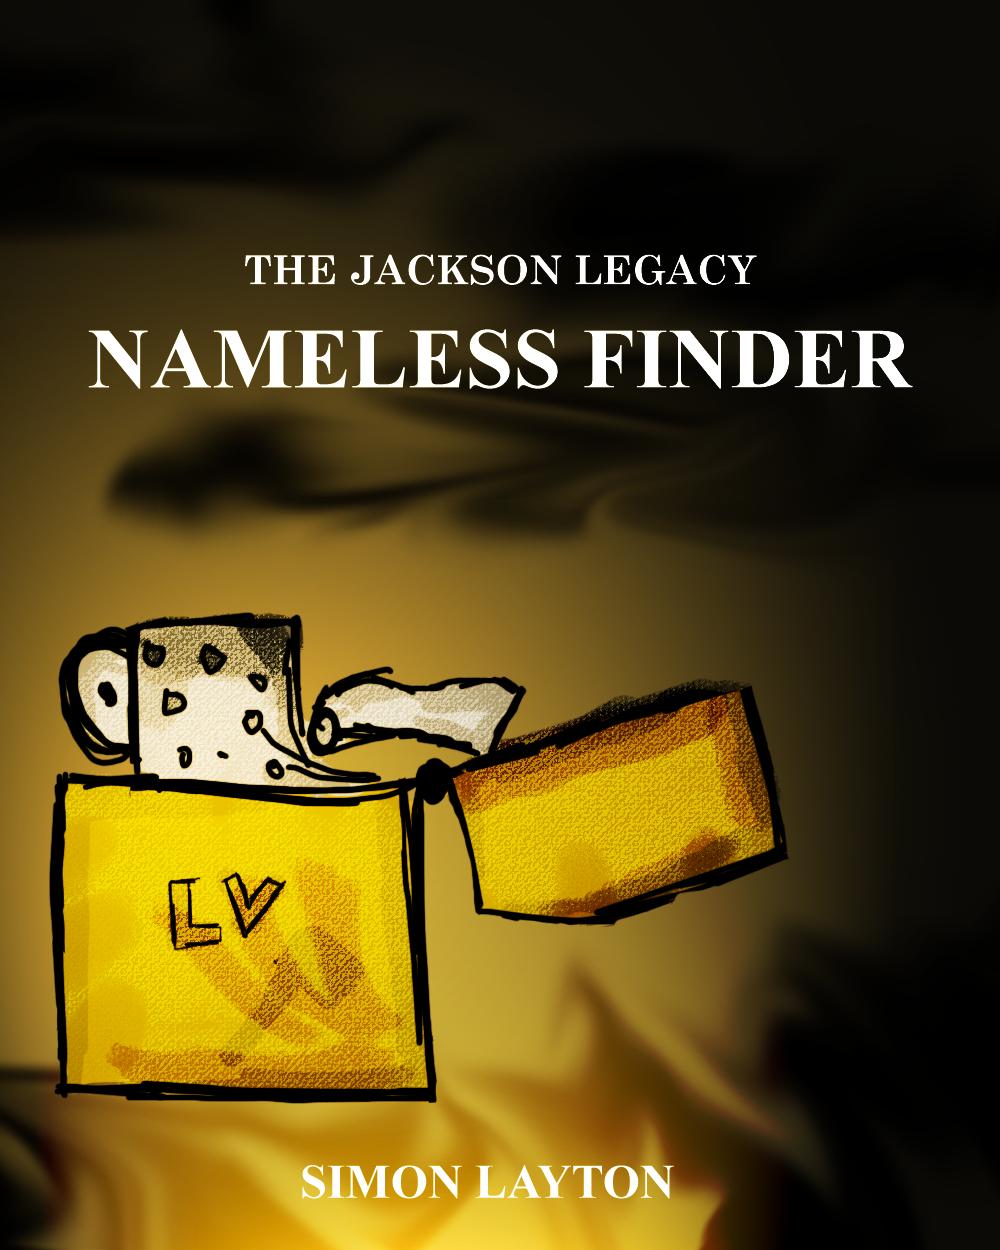 Nameless Finder | Percy Jackson Fanfiction Wiki | FANDOM